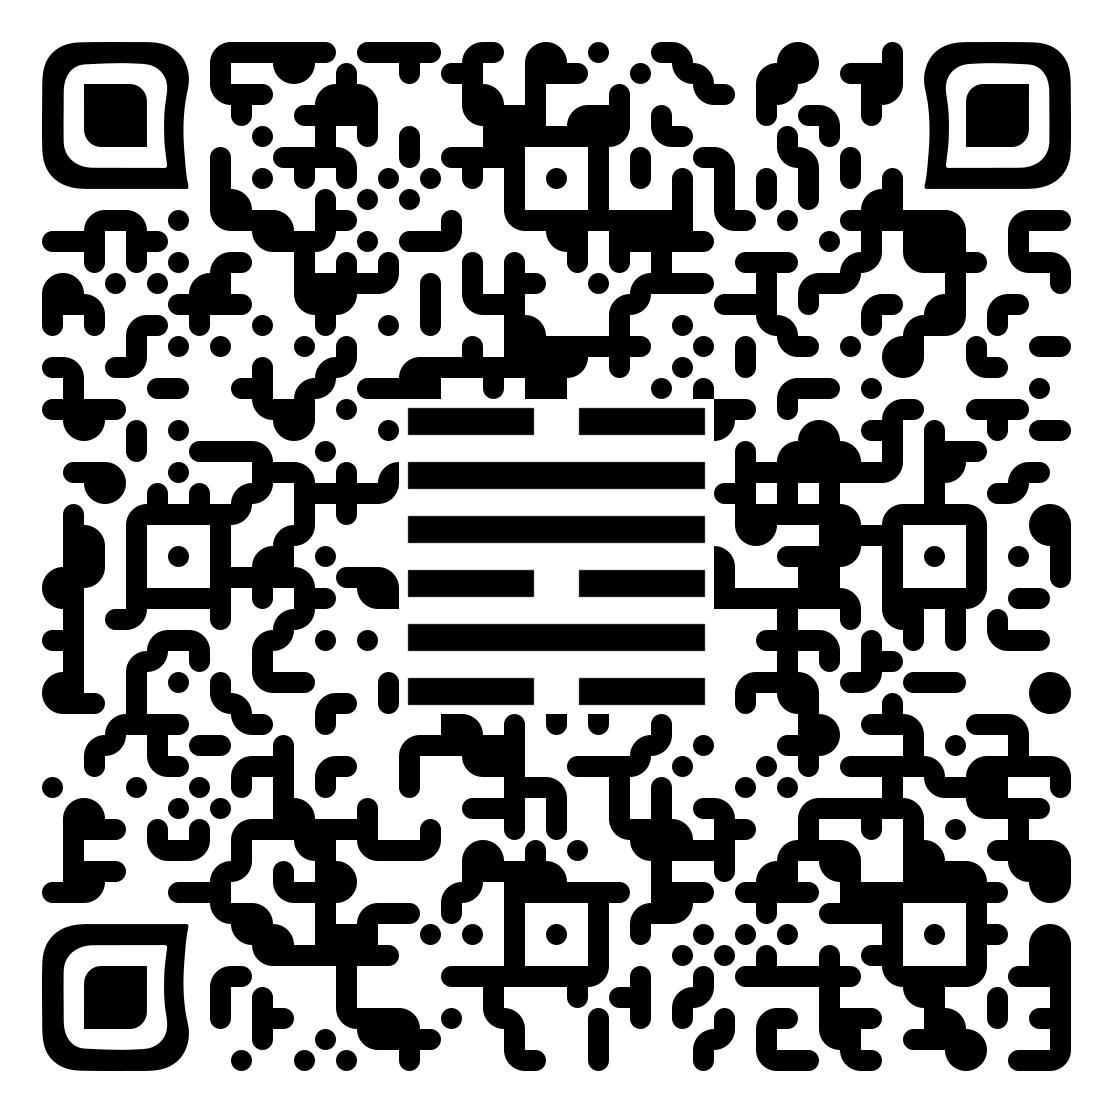 qr-code-47.png